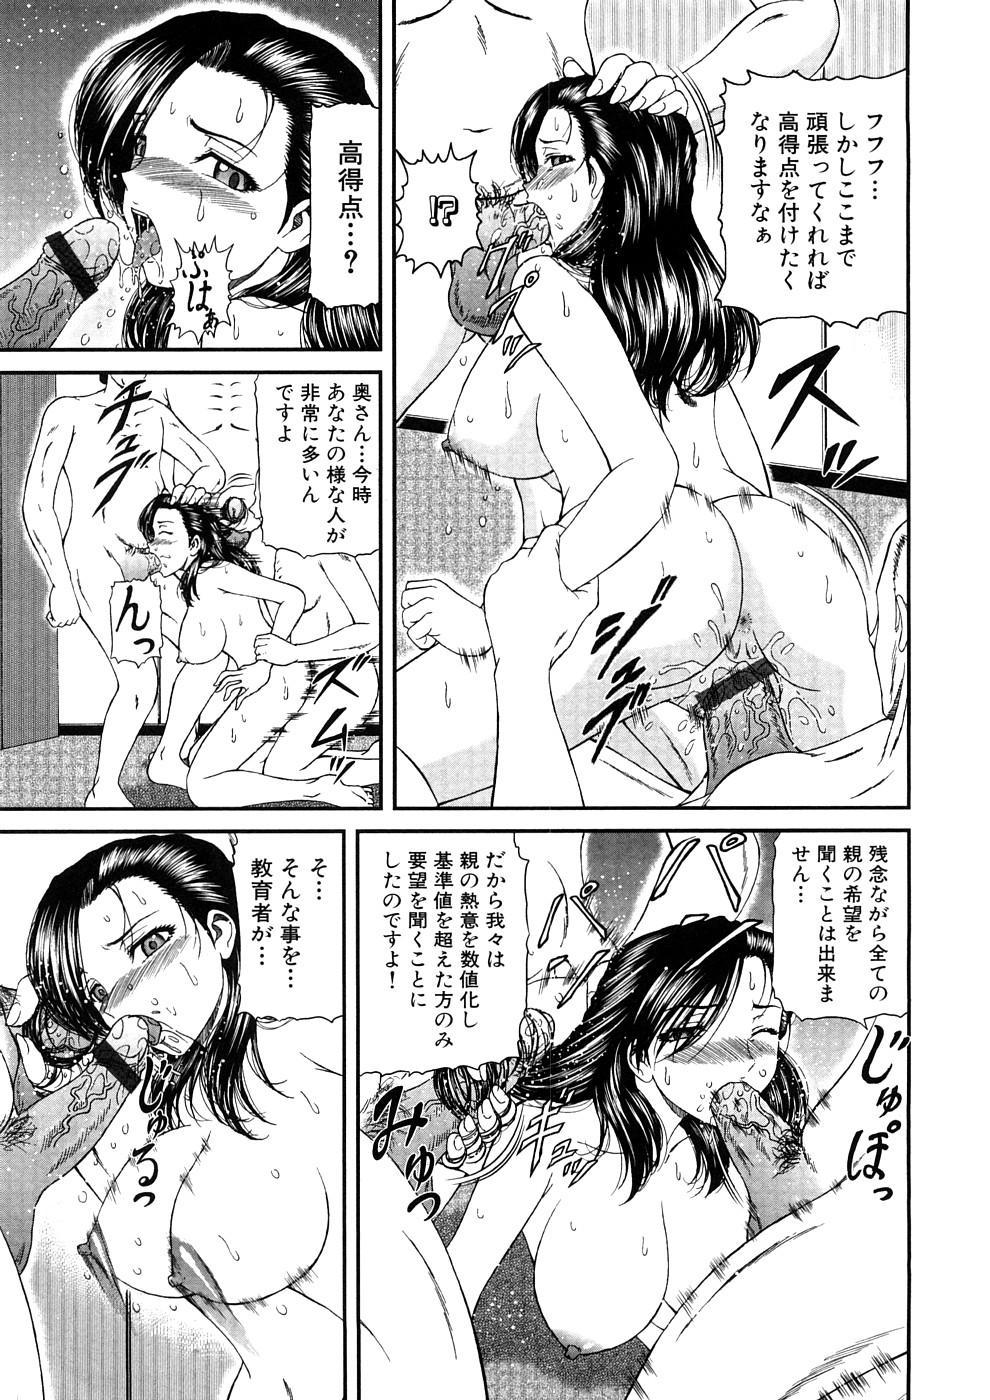 Geki Yaba Anthology Vol. 1 - Naka ni Dashite yo 151